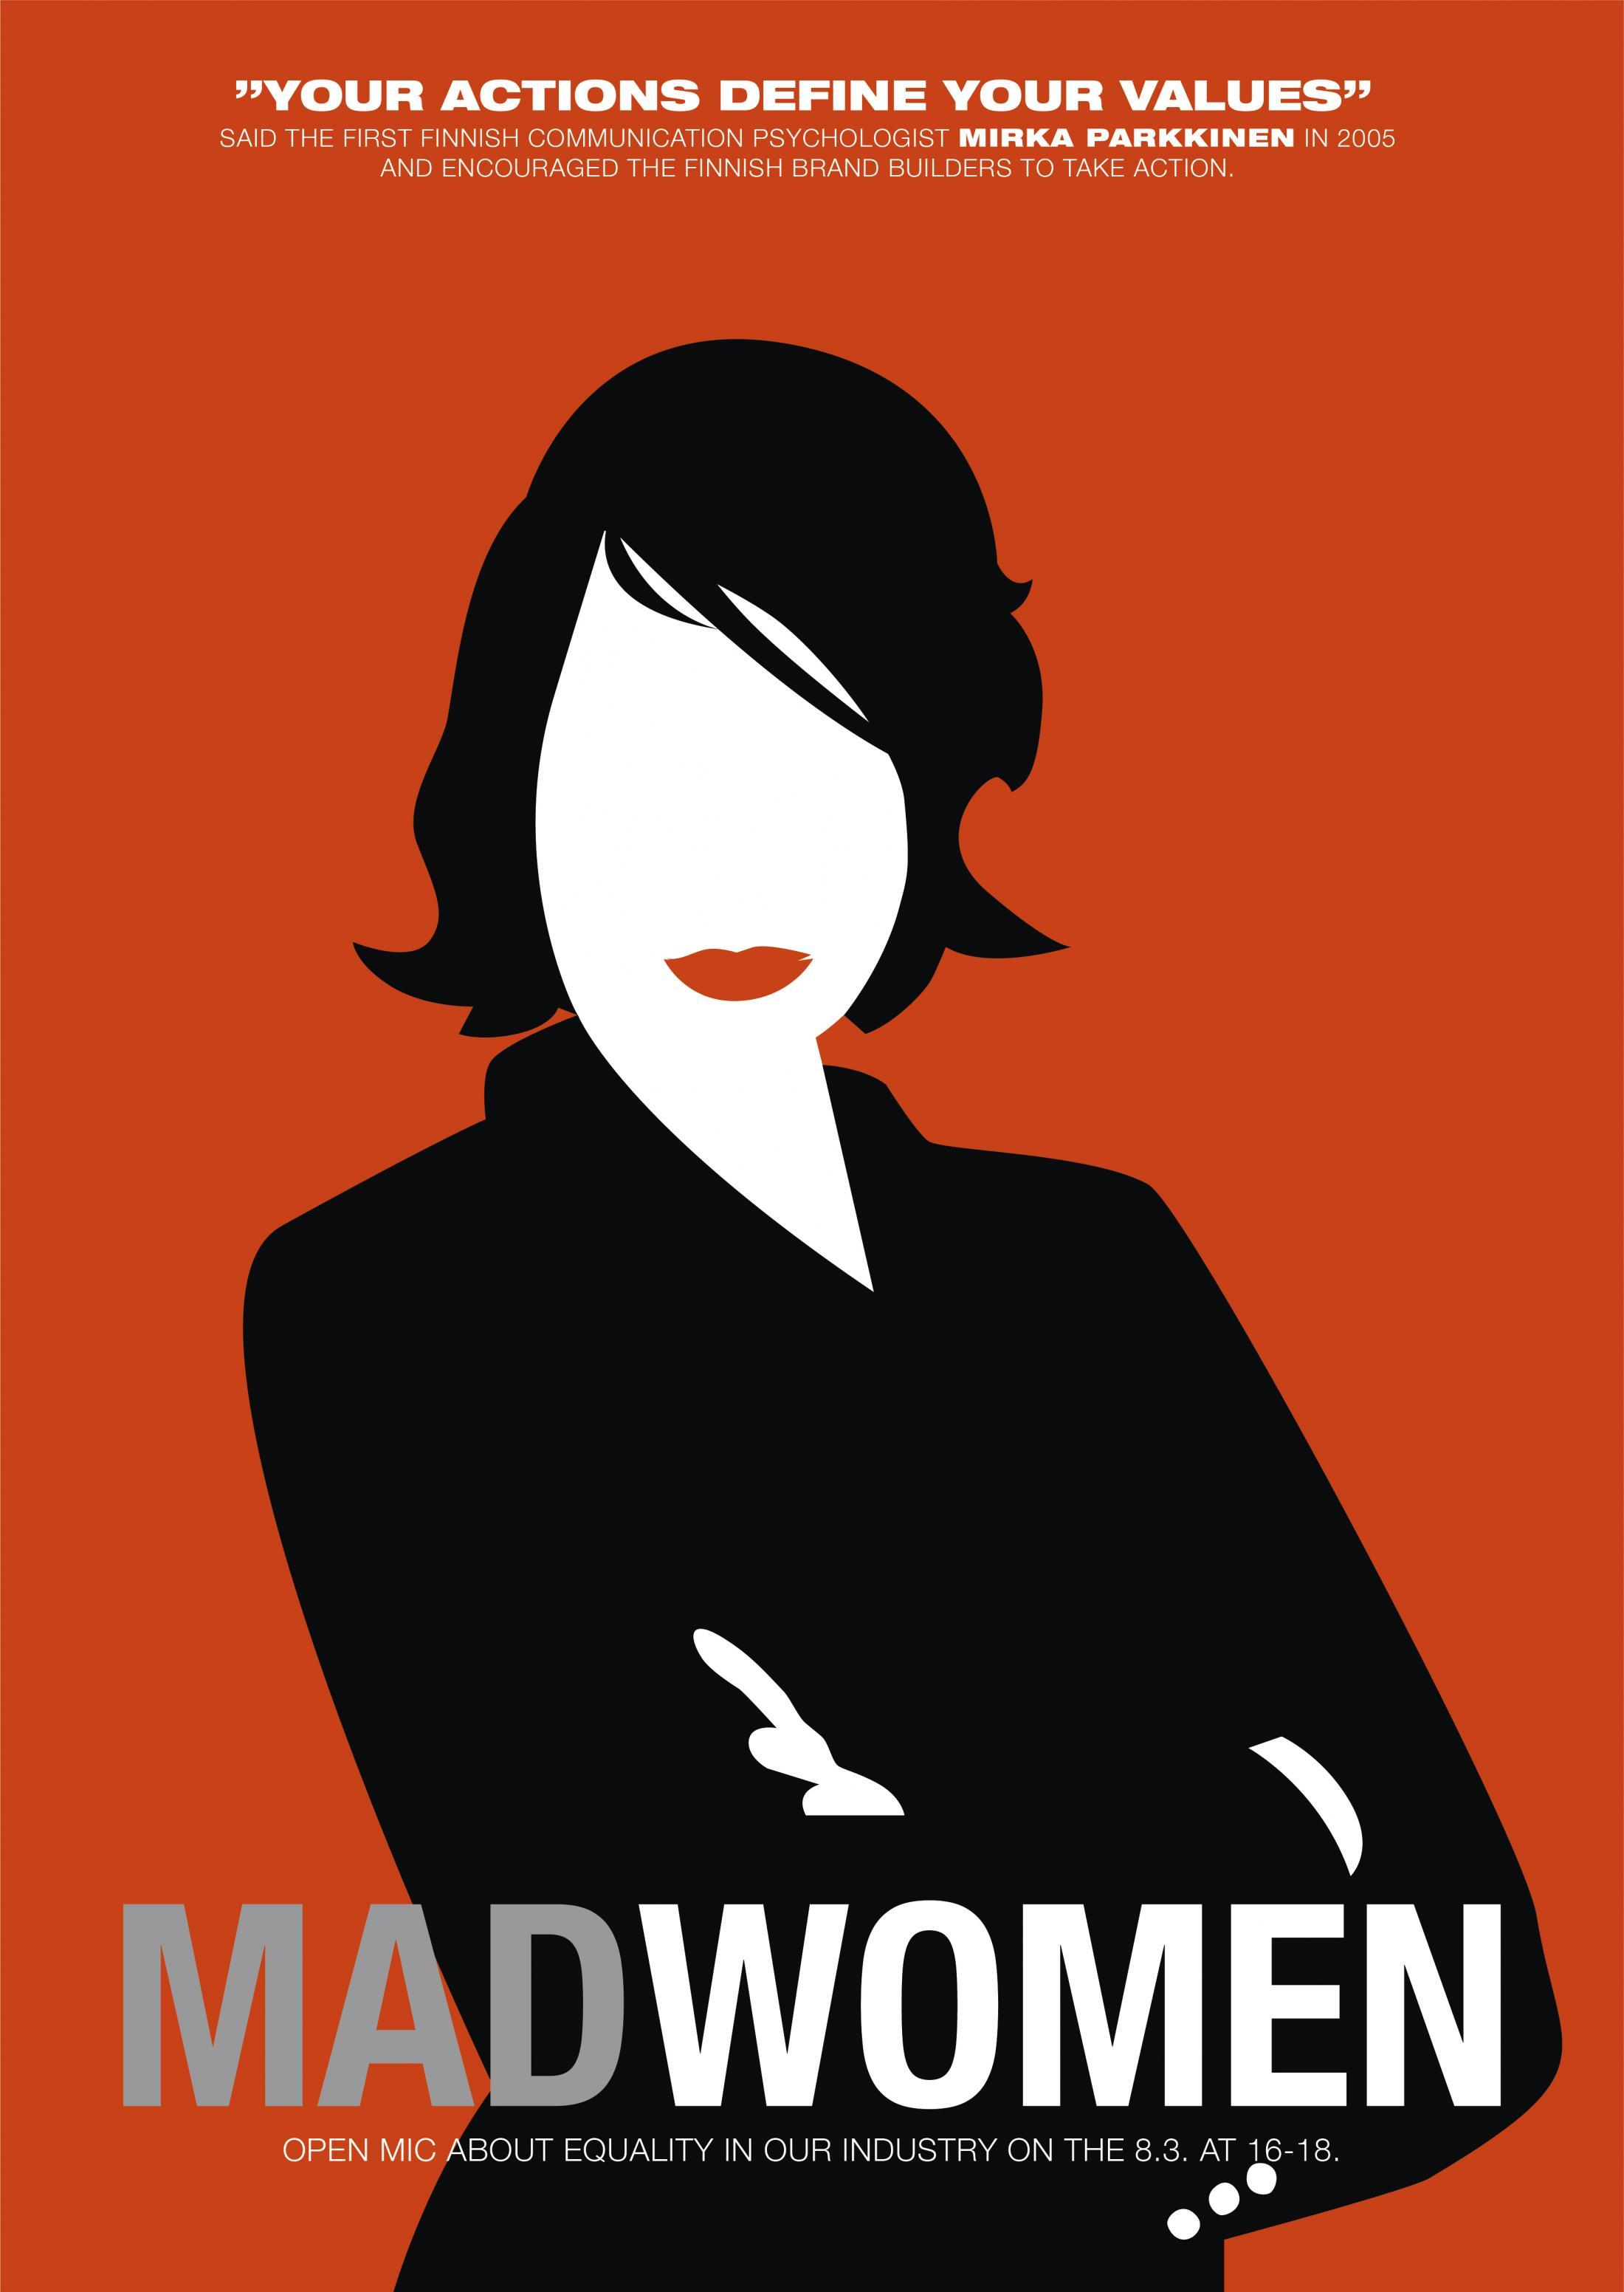 mad_women_by_sek_mirka_parkkinen_poster_0